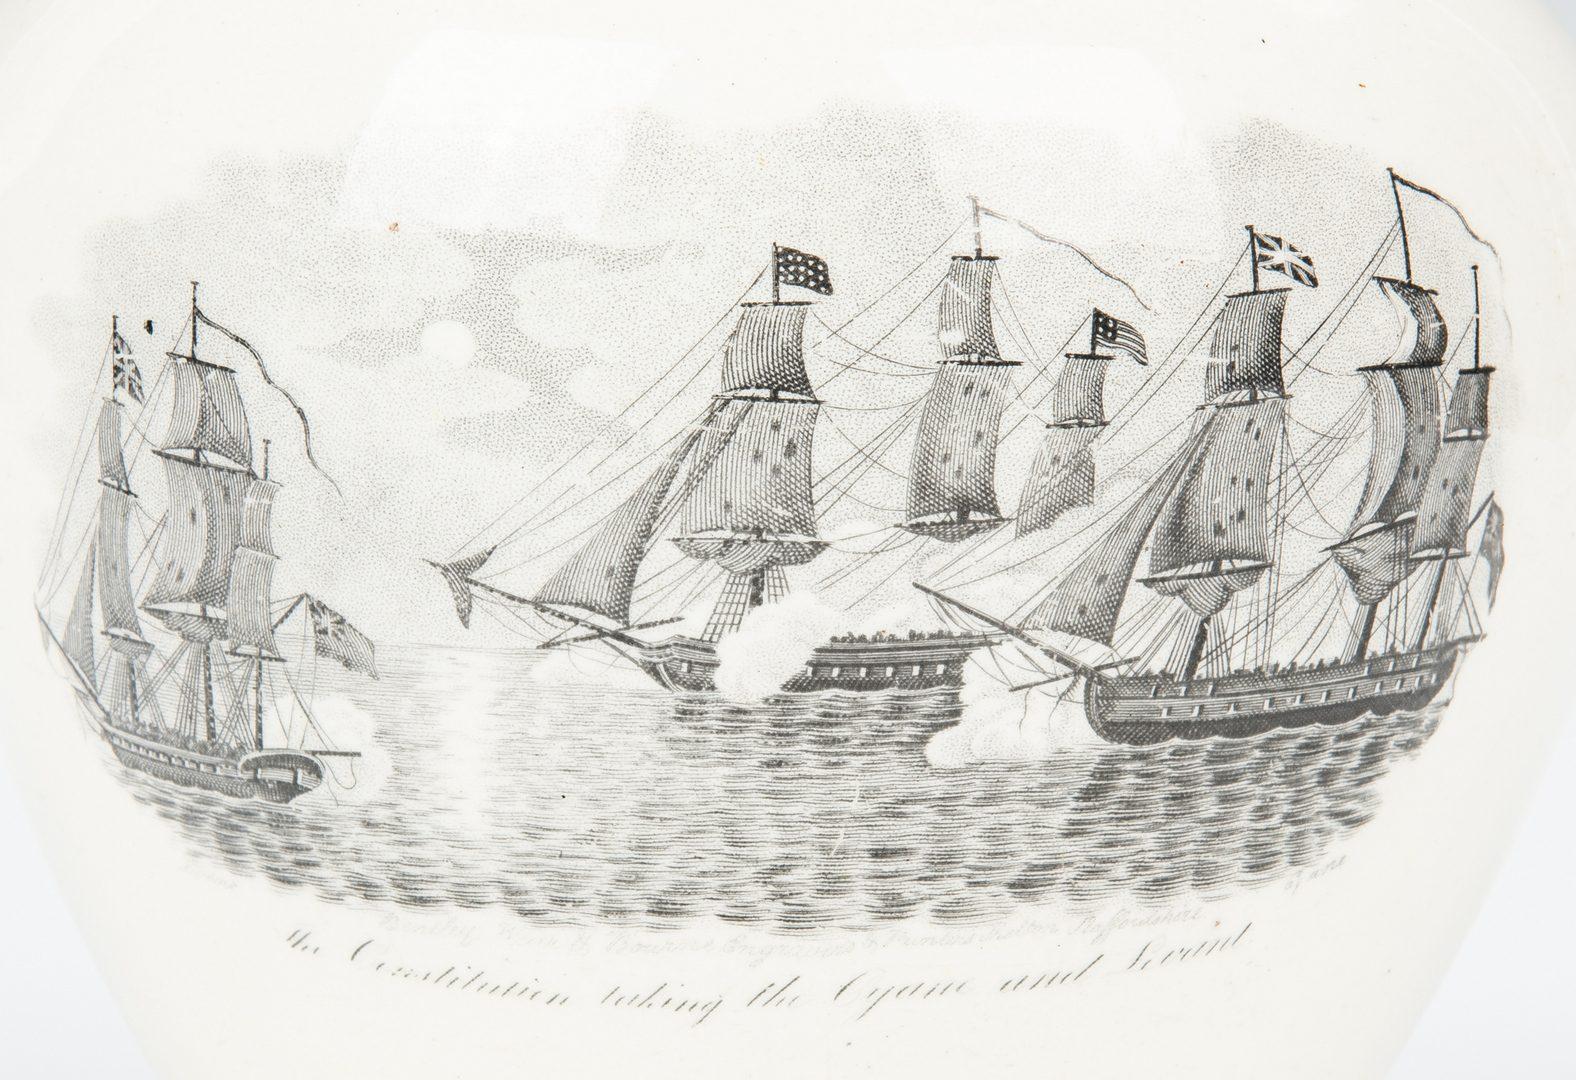 Lot 332: War of 1812 Historical Staffordshire Lustre Ware Jug